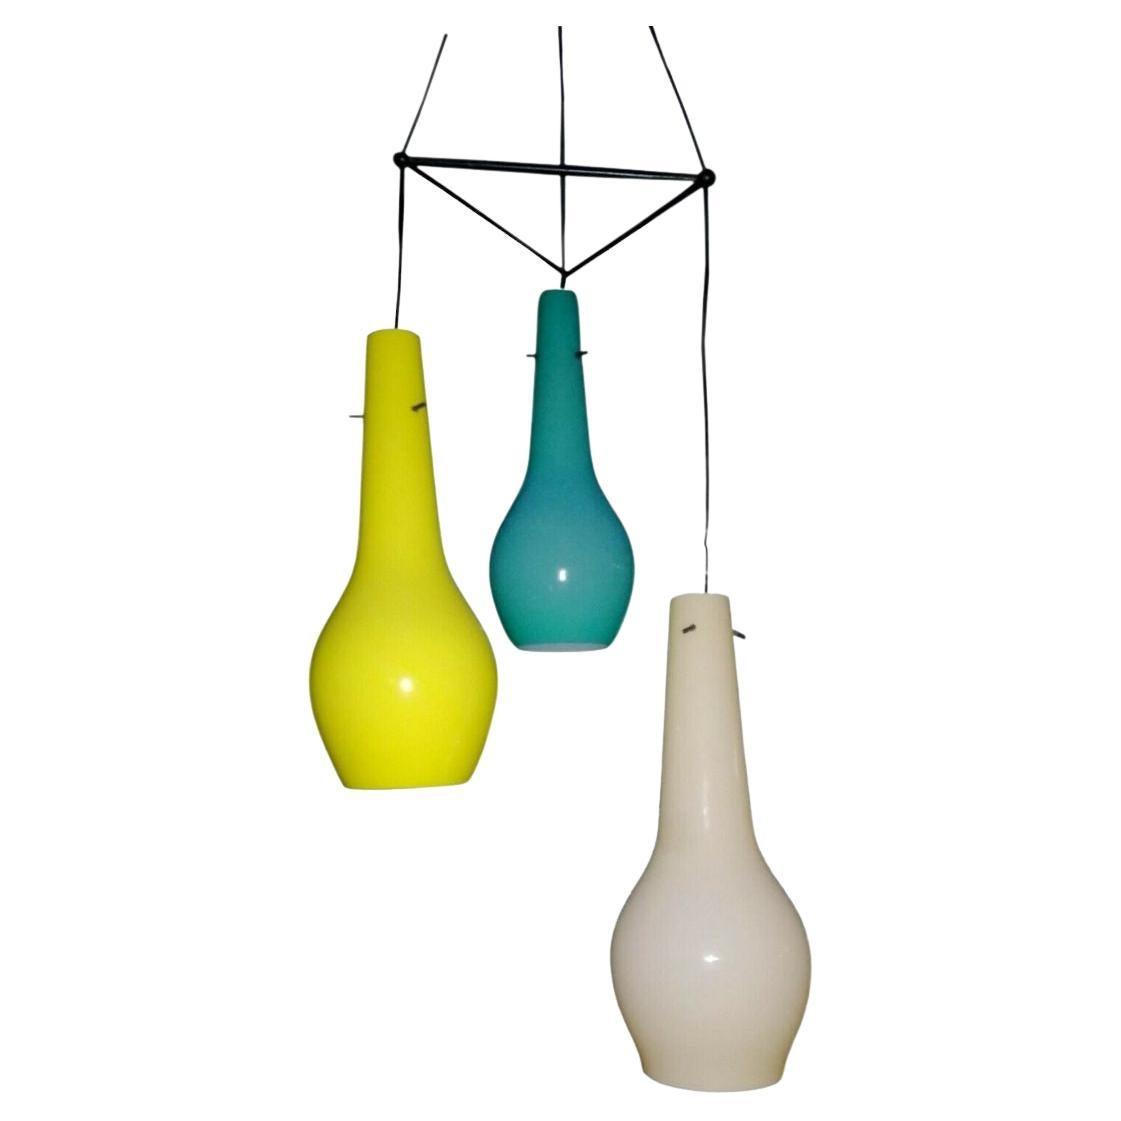 Three Lights Murano Glass Chandelier in the Style of Gino Vistosi, 1950s